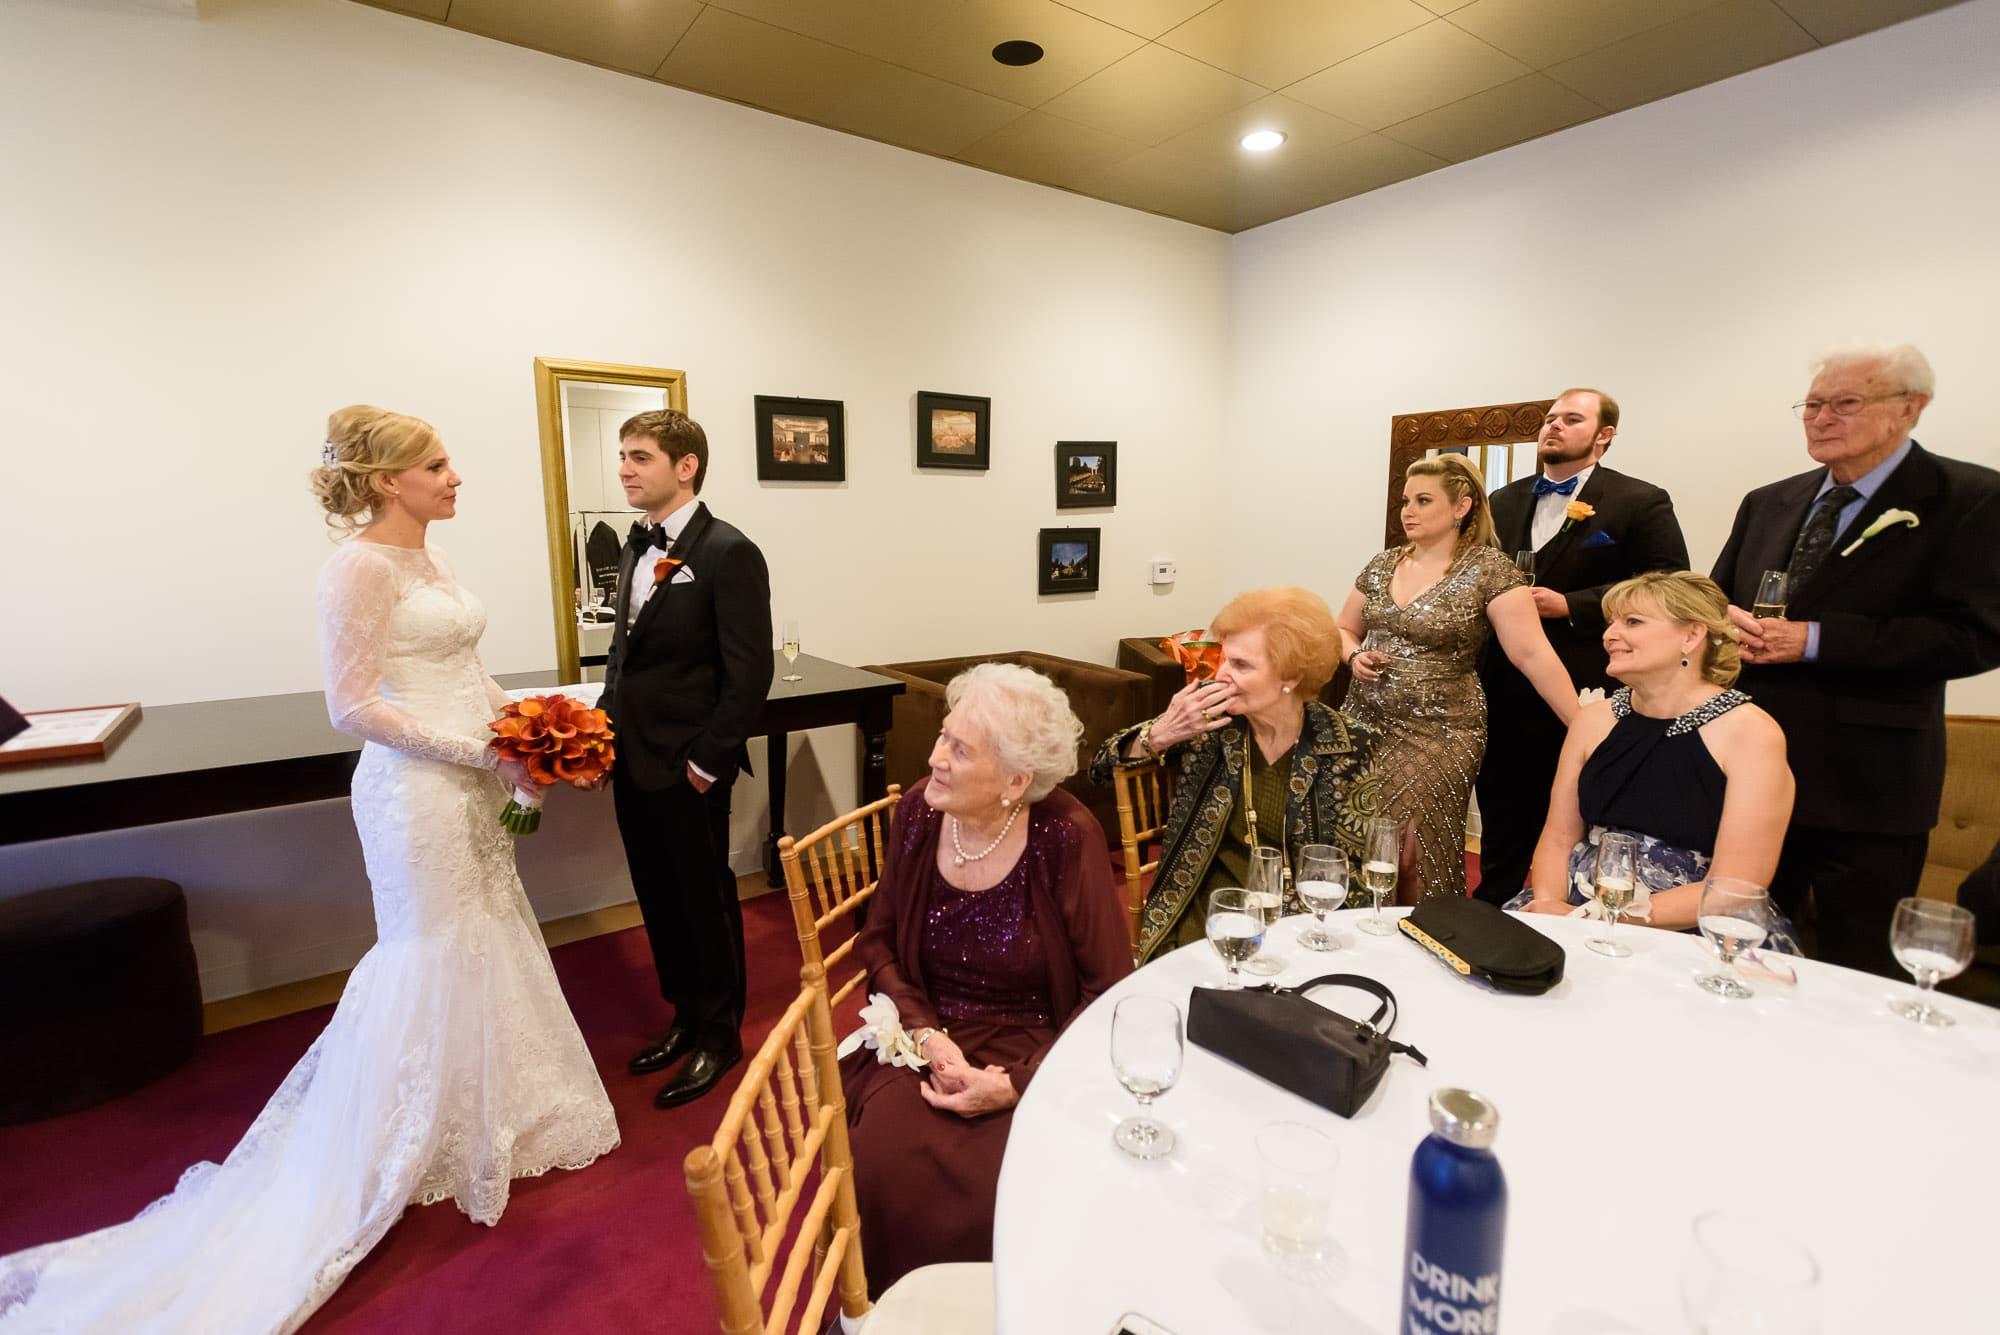 036_Alan_and_Heidi_Los_Angeles_Equestrian_Center_Wedding